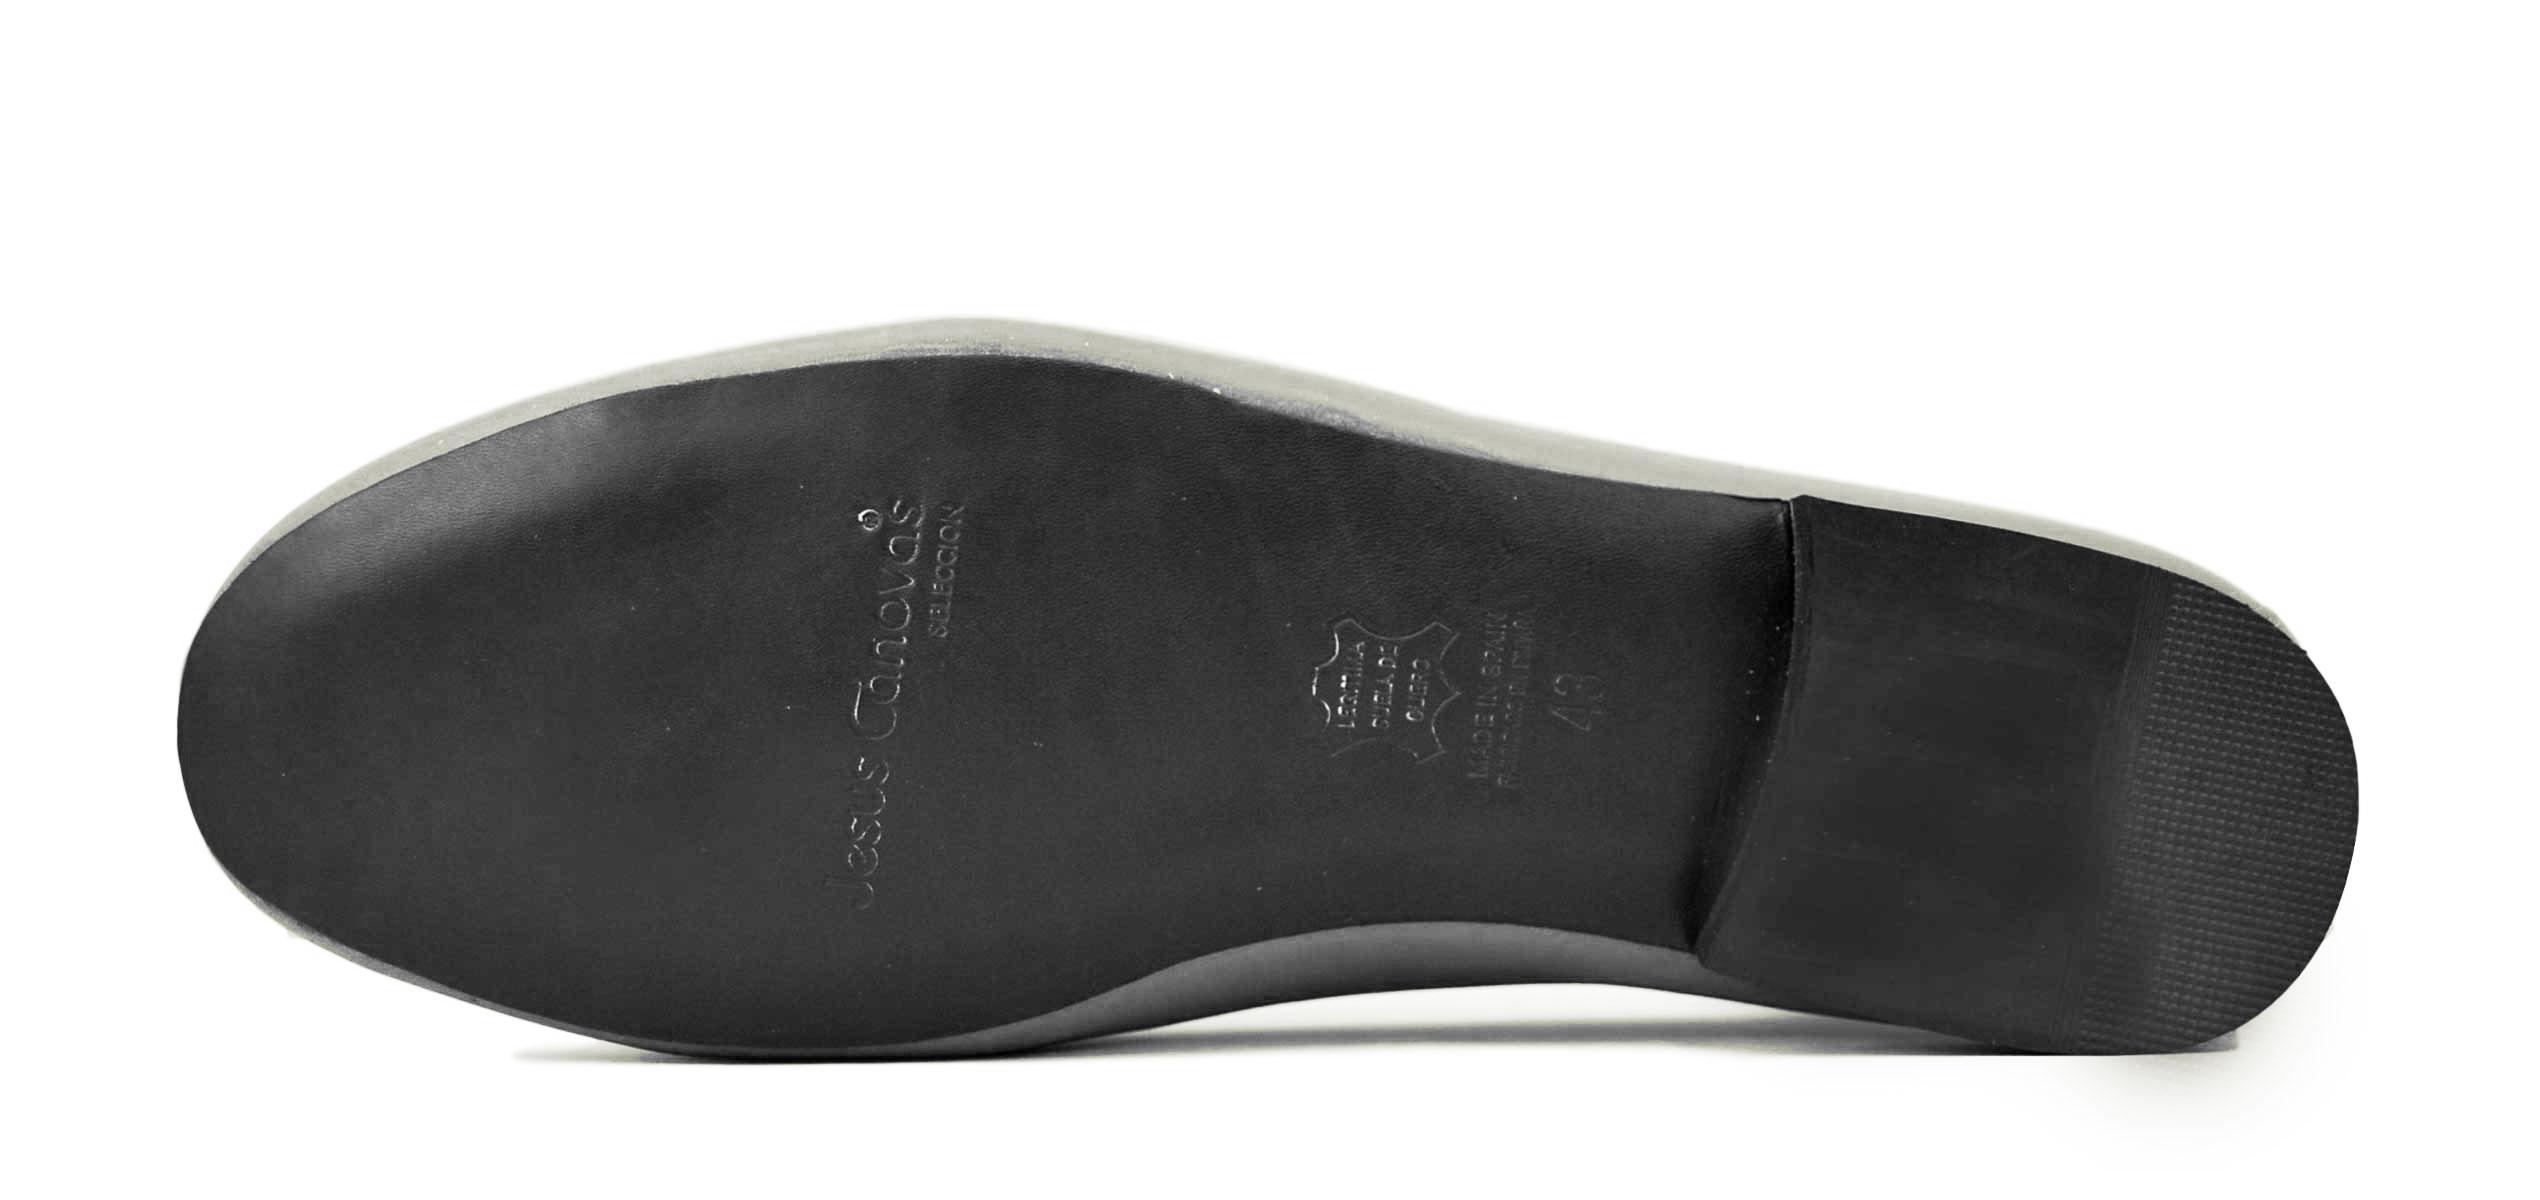 Foto 3 de Zapatos Julio Iglesias 528 JC Perla Napa Mocasin